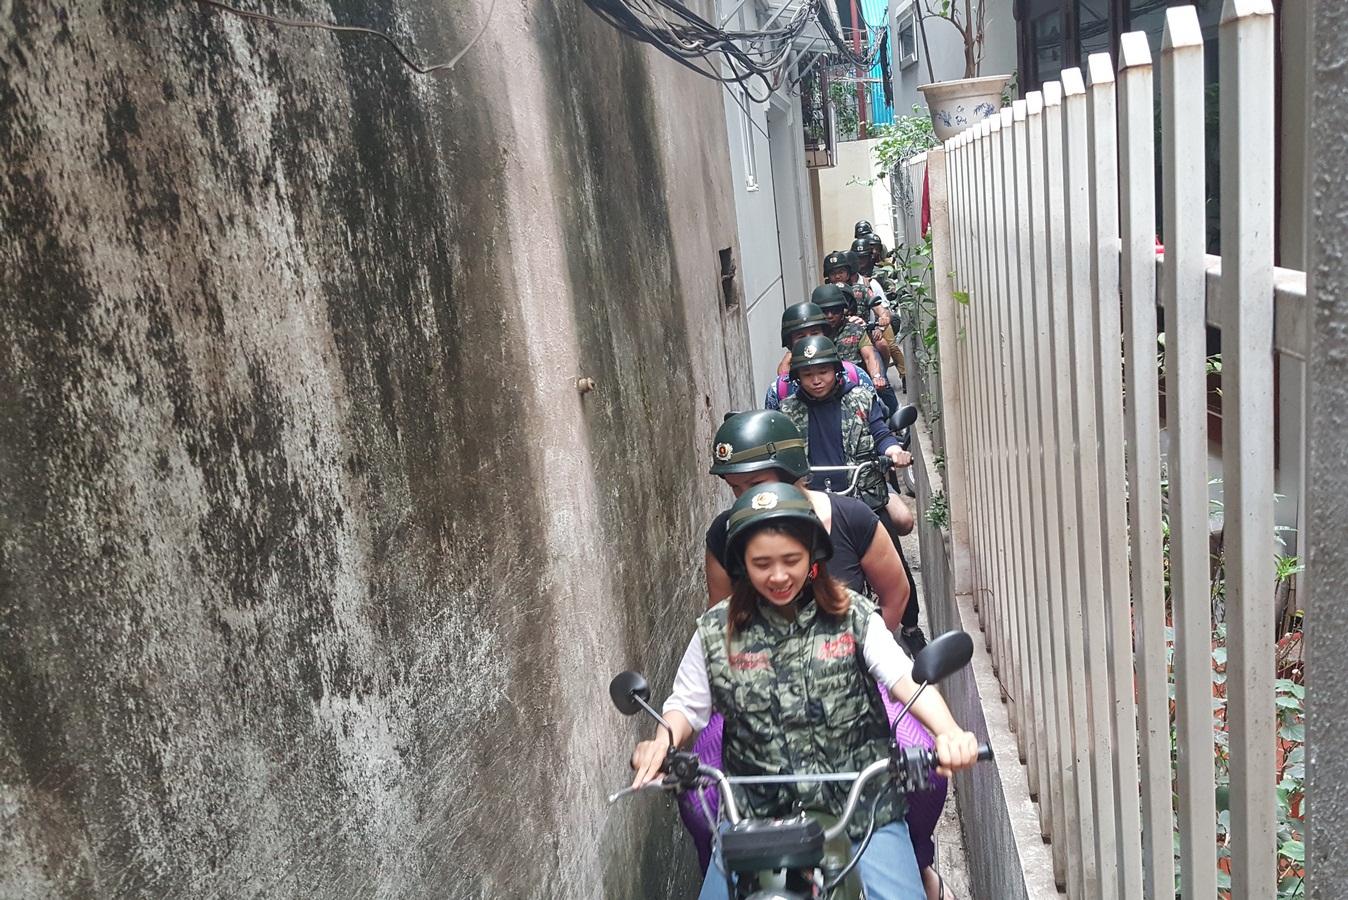 SPECIAL HANOI MOTORBIKE FOOD TOURS BY NIGHT –  FOODIE ON ANTIQUE MINSK MOTORBIKE – HBT2